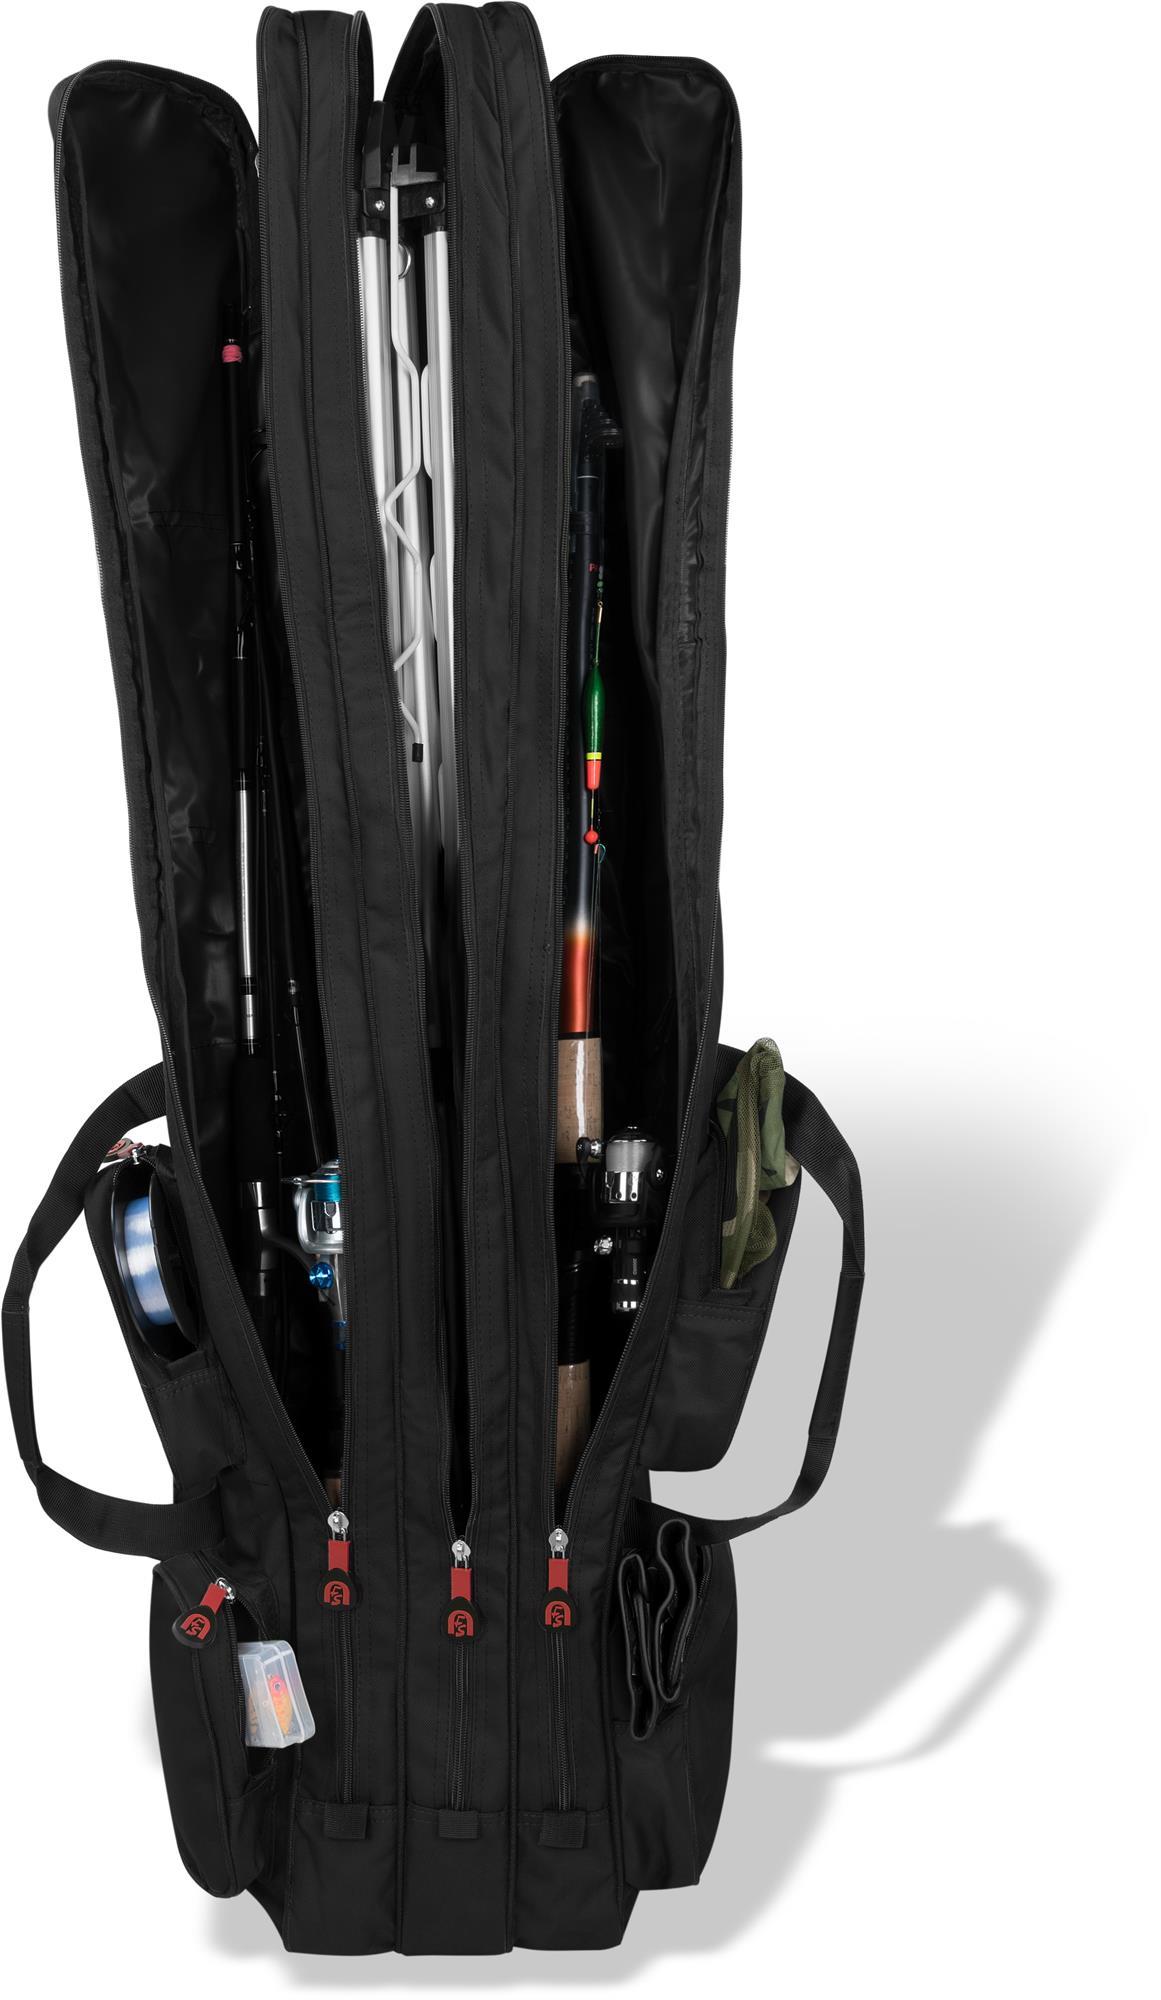 Verschiedene L/ängen normani Rutentasche RodBox Triple Allround Rutenfutteral 3 F/ächer